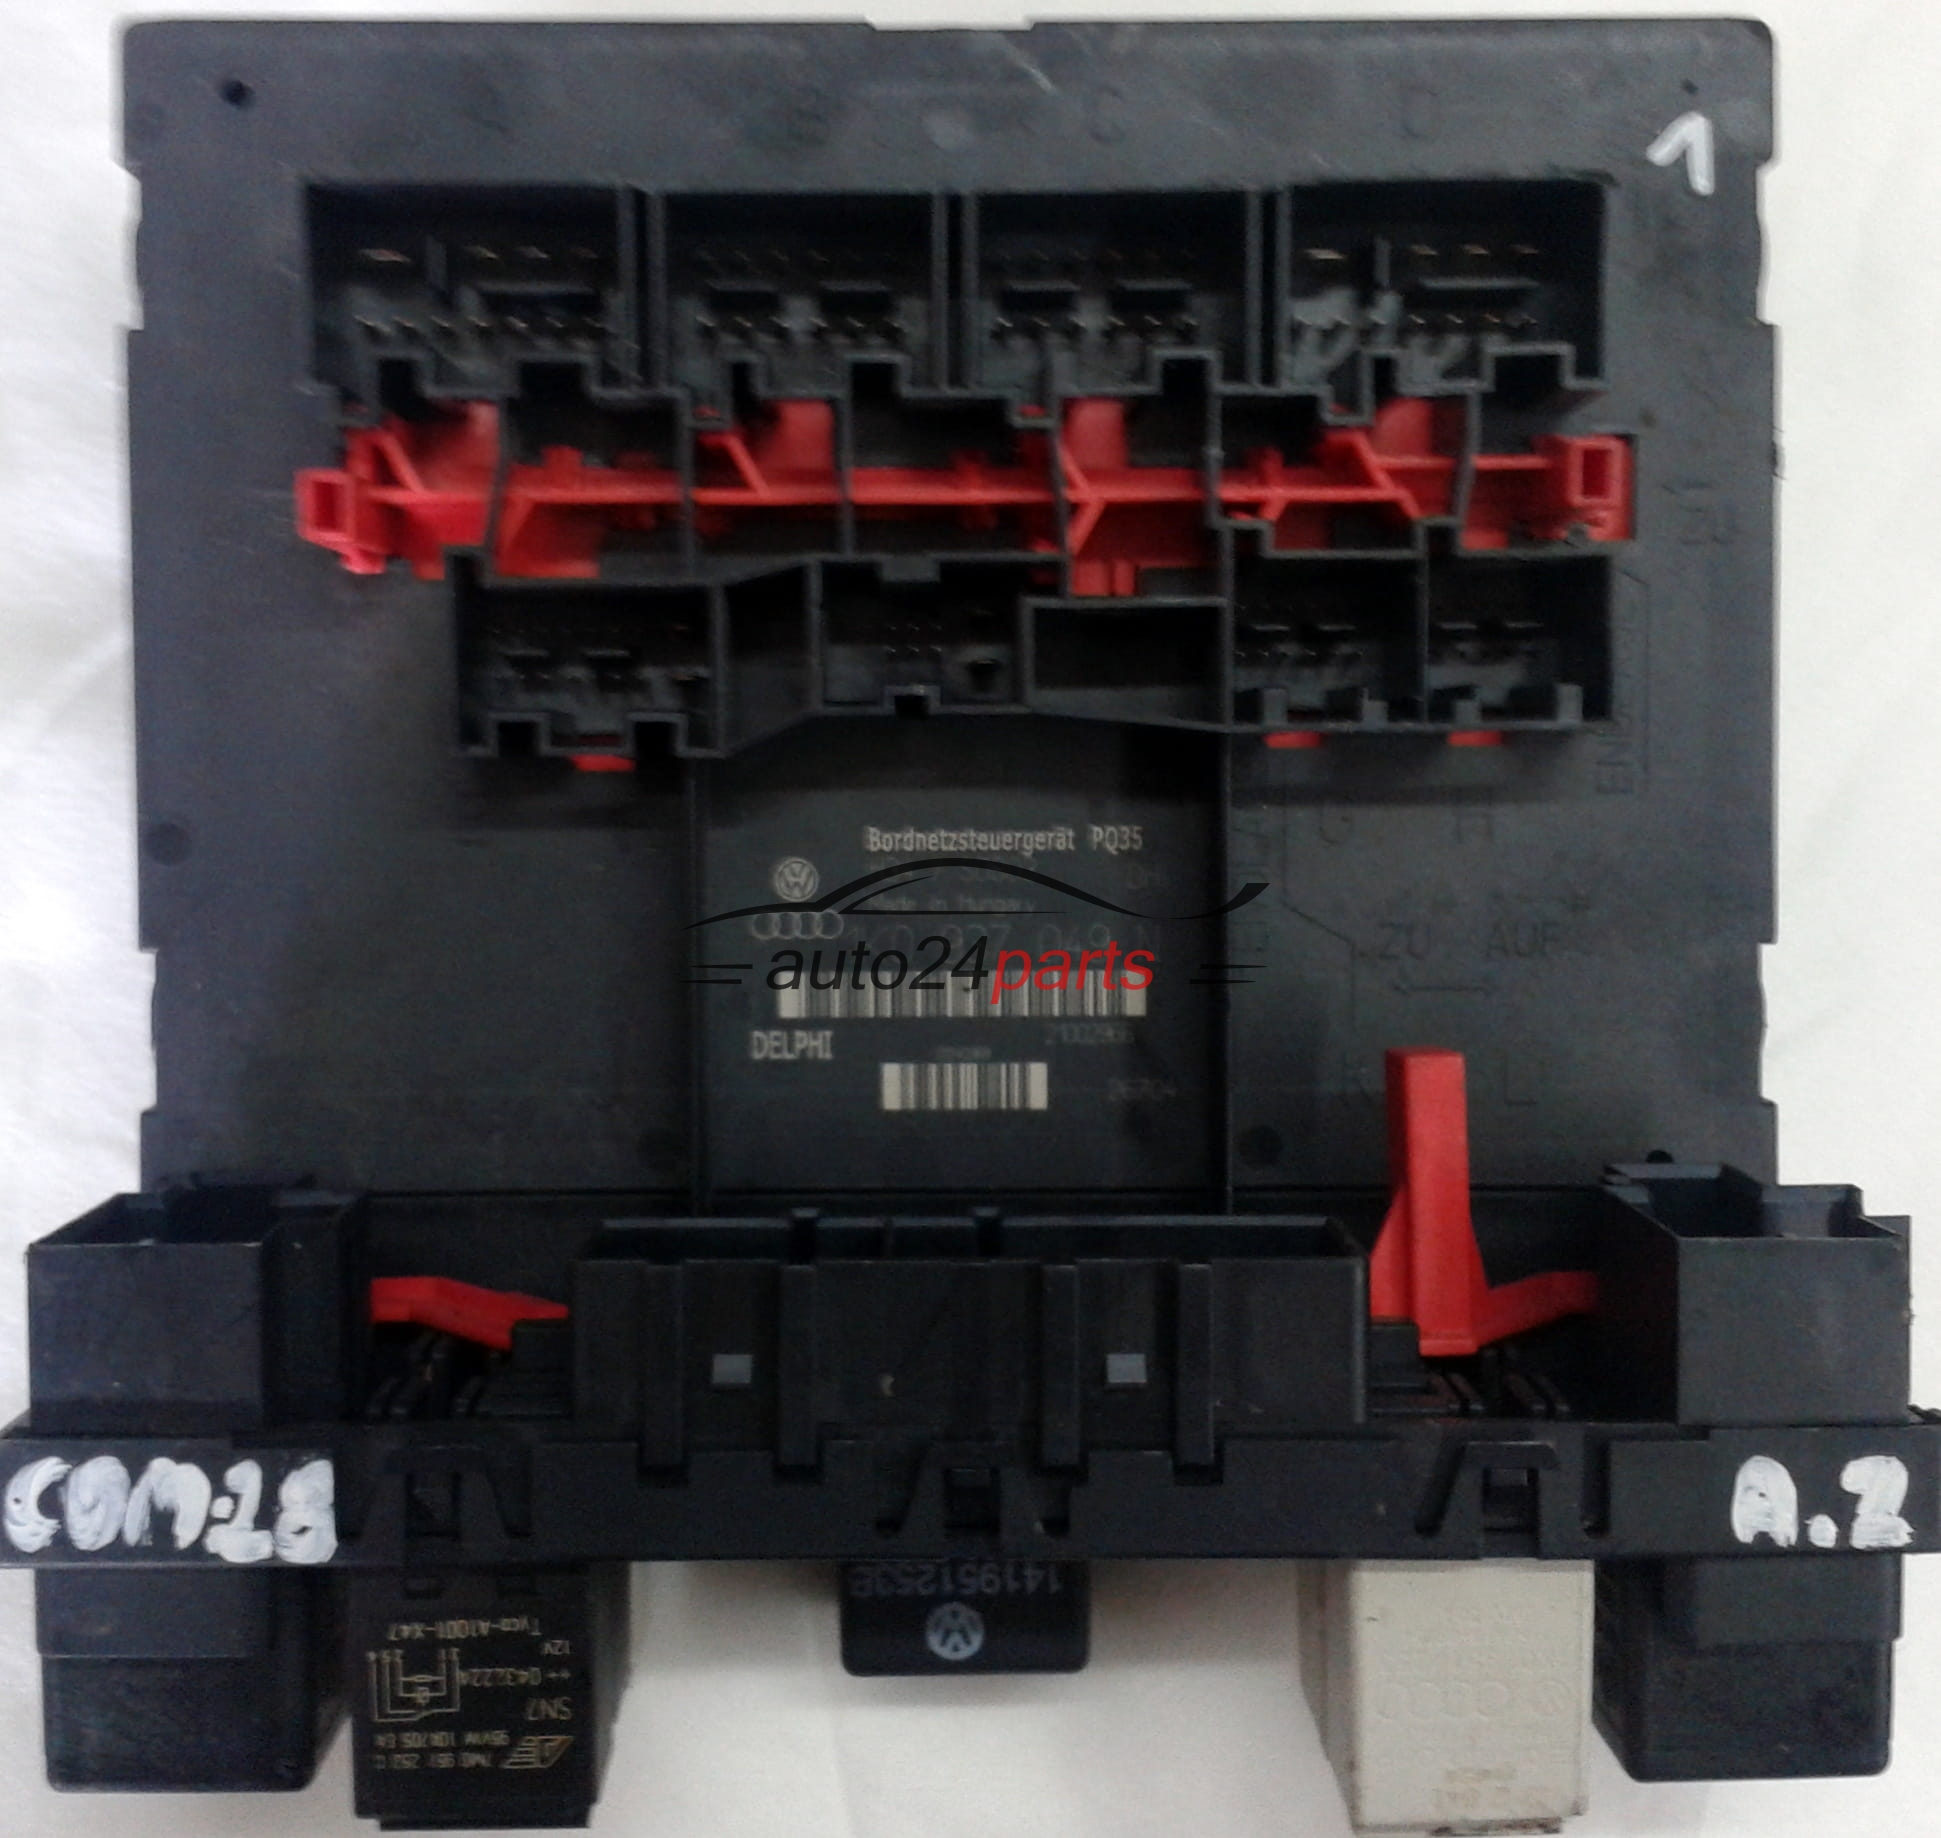 comfort control module bordnetzsteuerger t pq35 h34 s0803. Black Bedroom Furniture Sets. Home Design Ideas